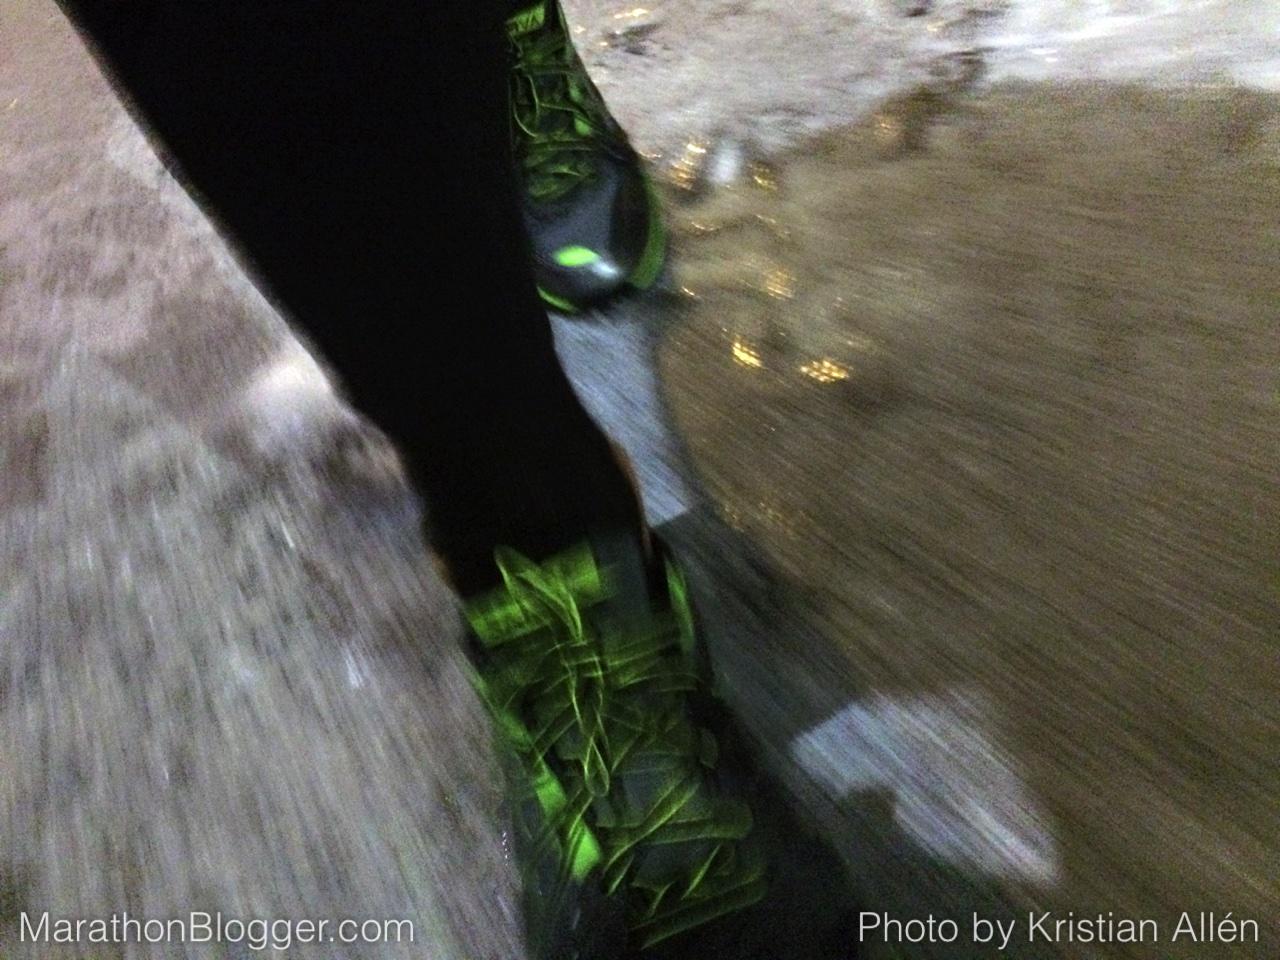 19.1.2015 5.01 km Run